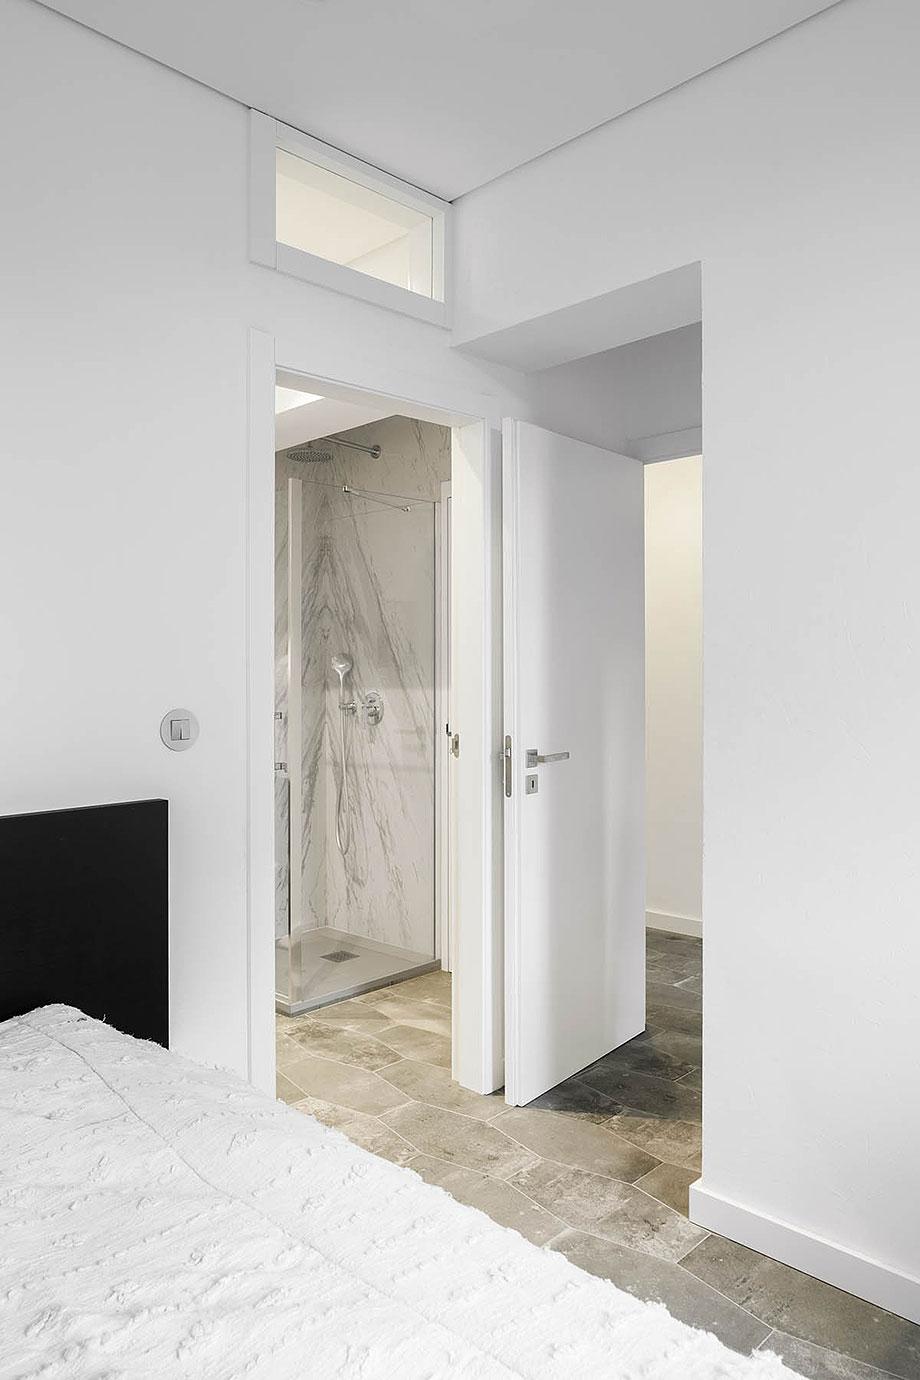 apartamento en oporto por paulo moreira architectures (15) - foto ivo tavares